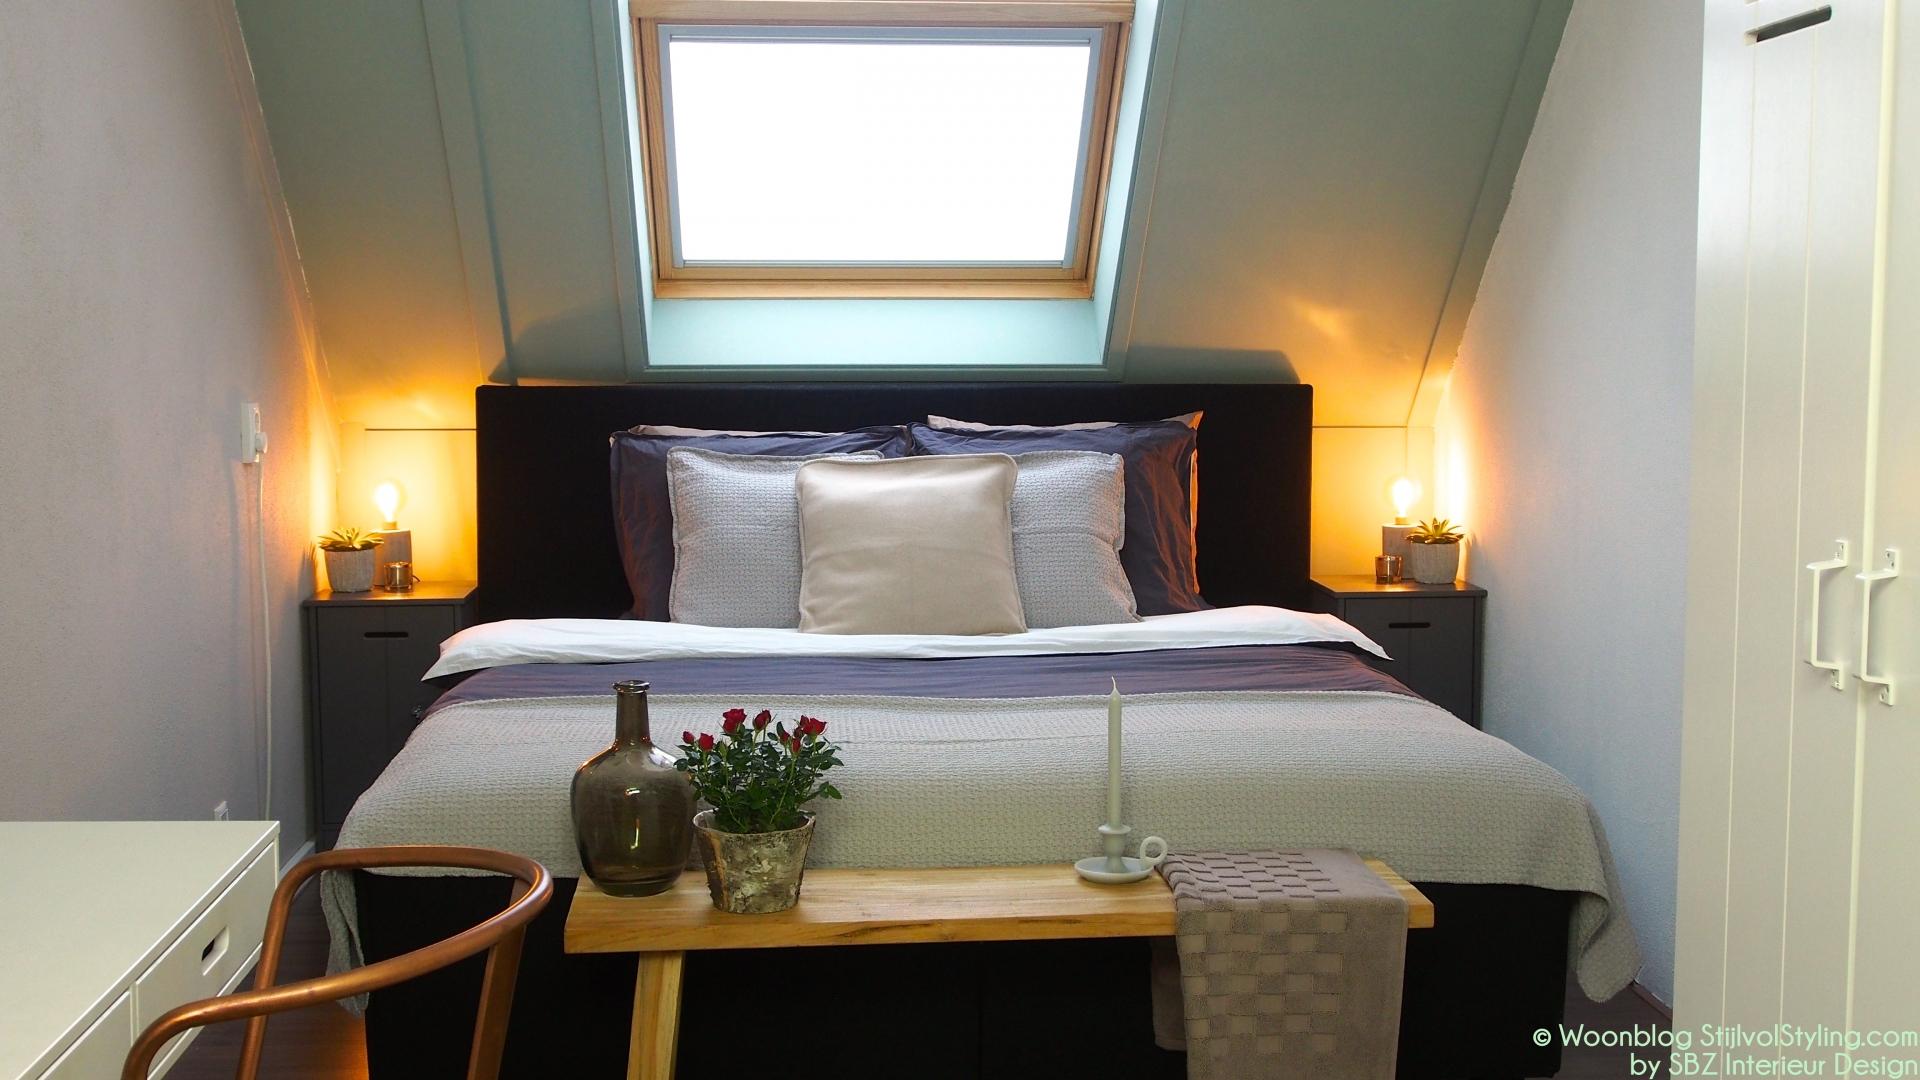 16 . Interieur Luxe hotel gevoel in eigen slaapkamer • Stijlvol ...